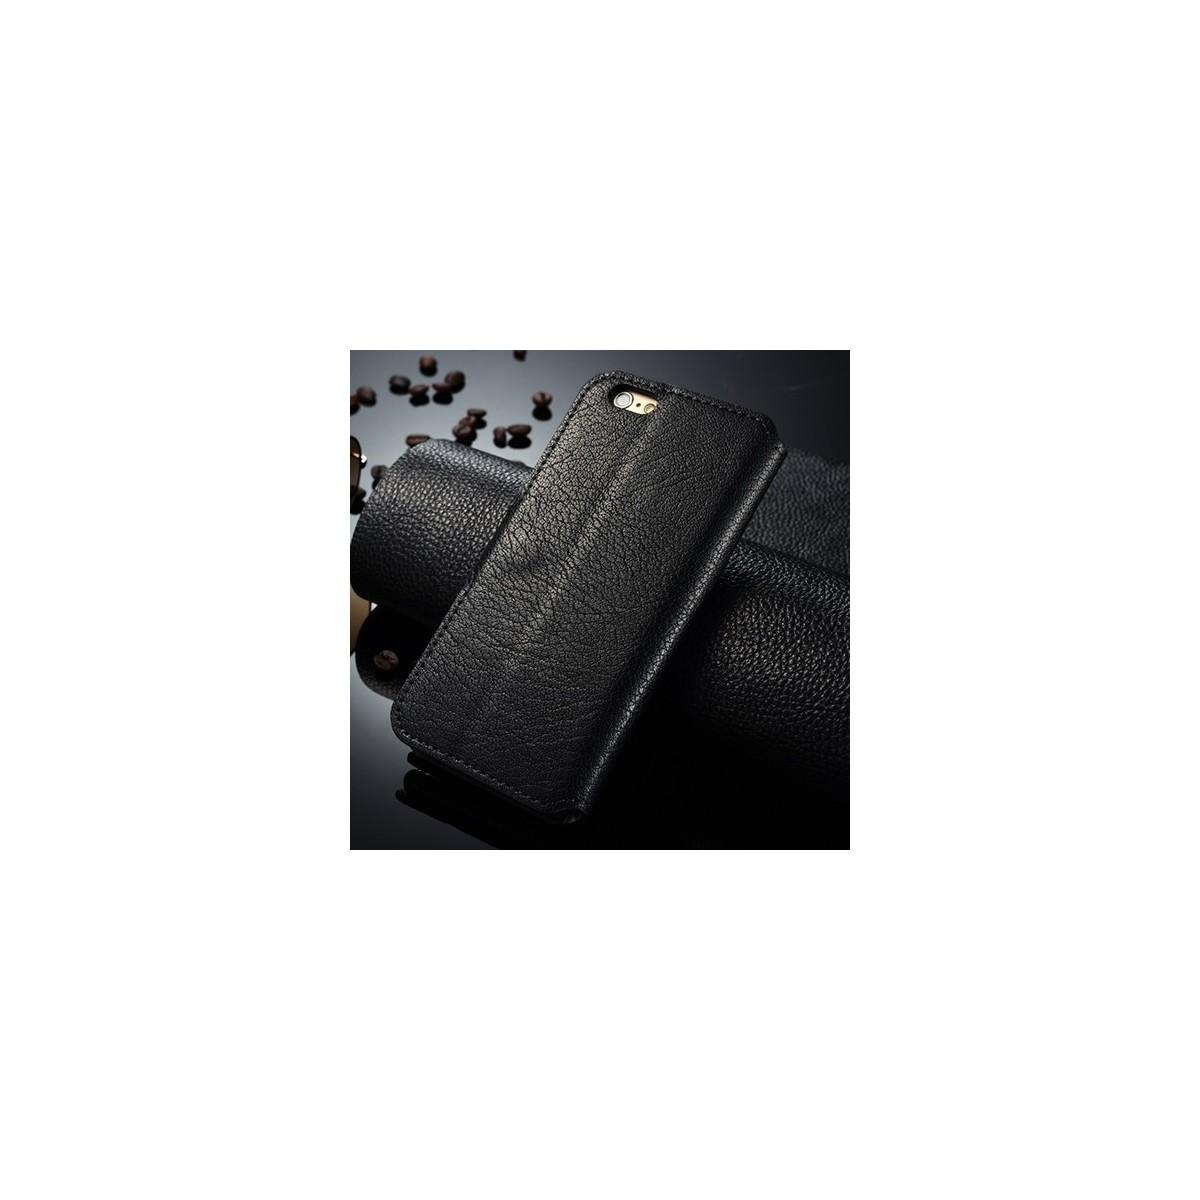 Etui iPhone 6 Book type noir - CaseMe